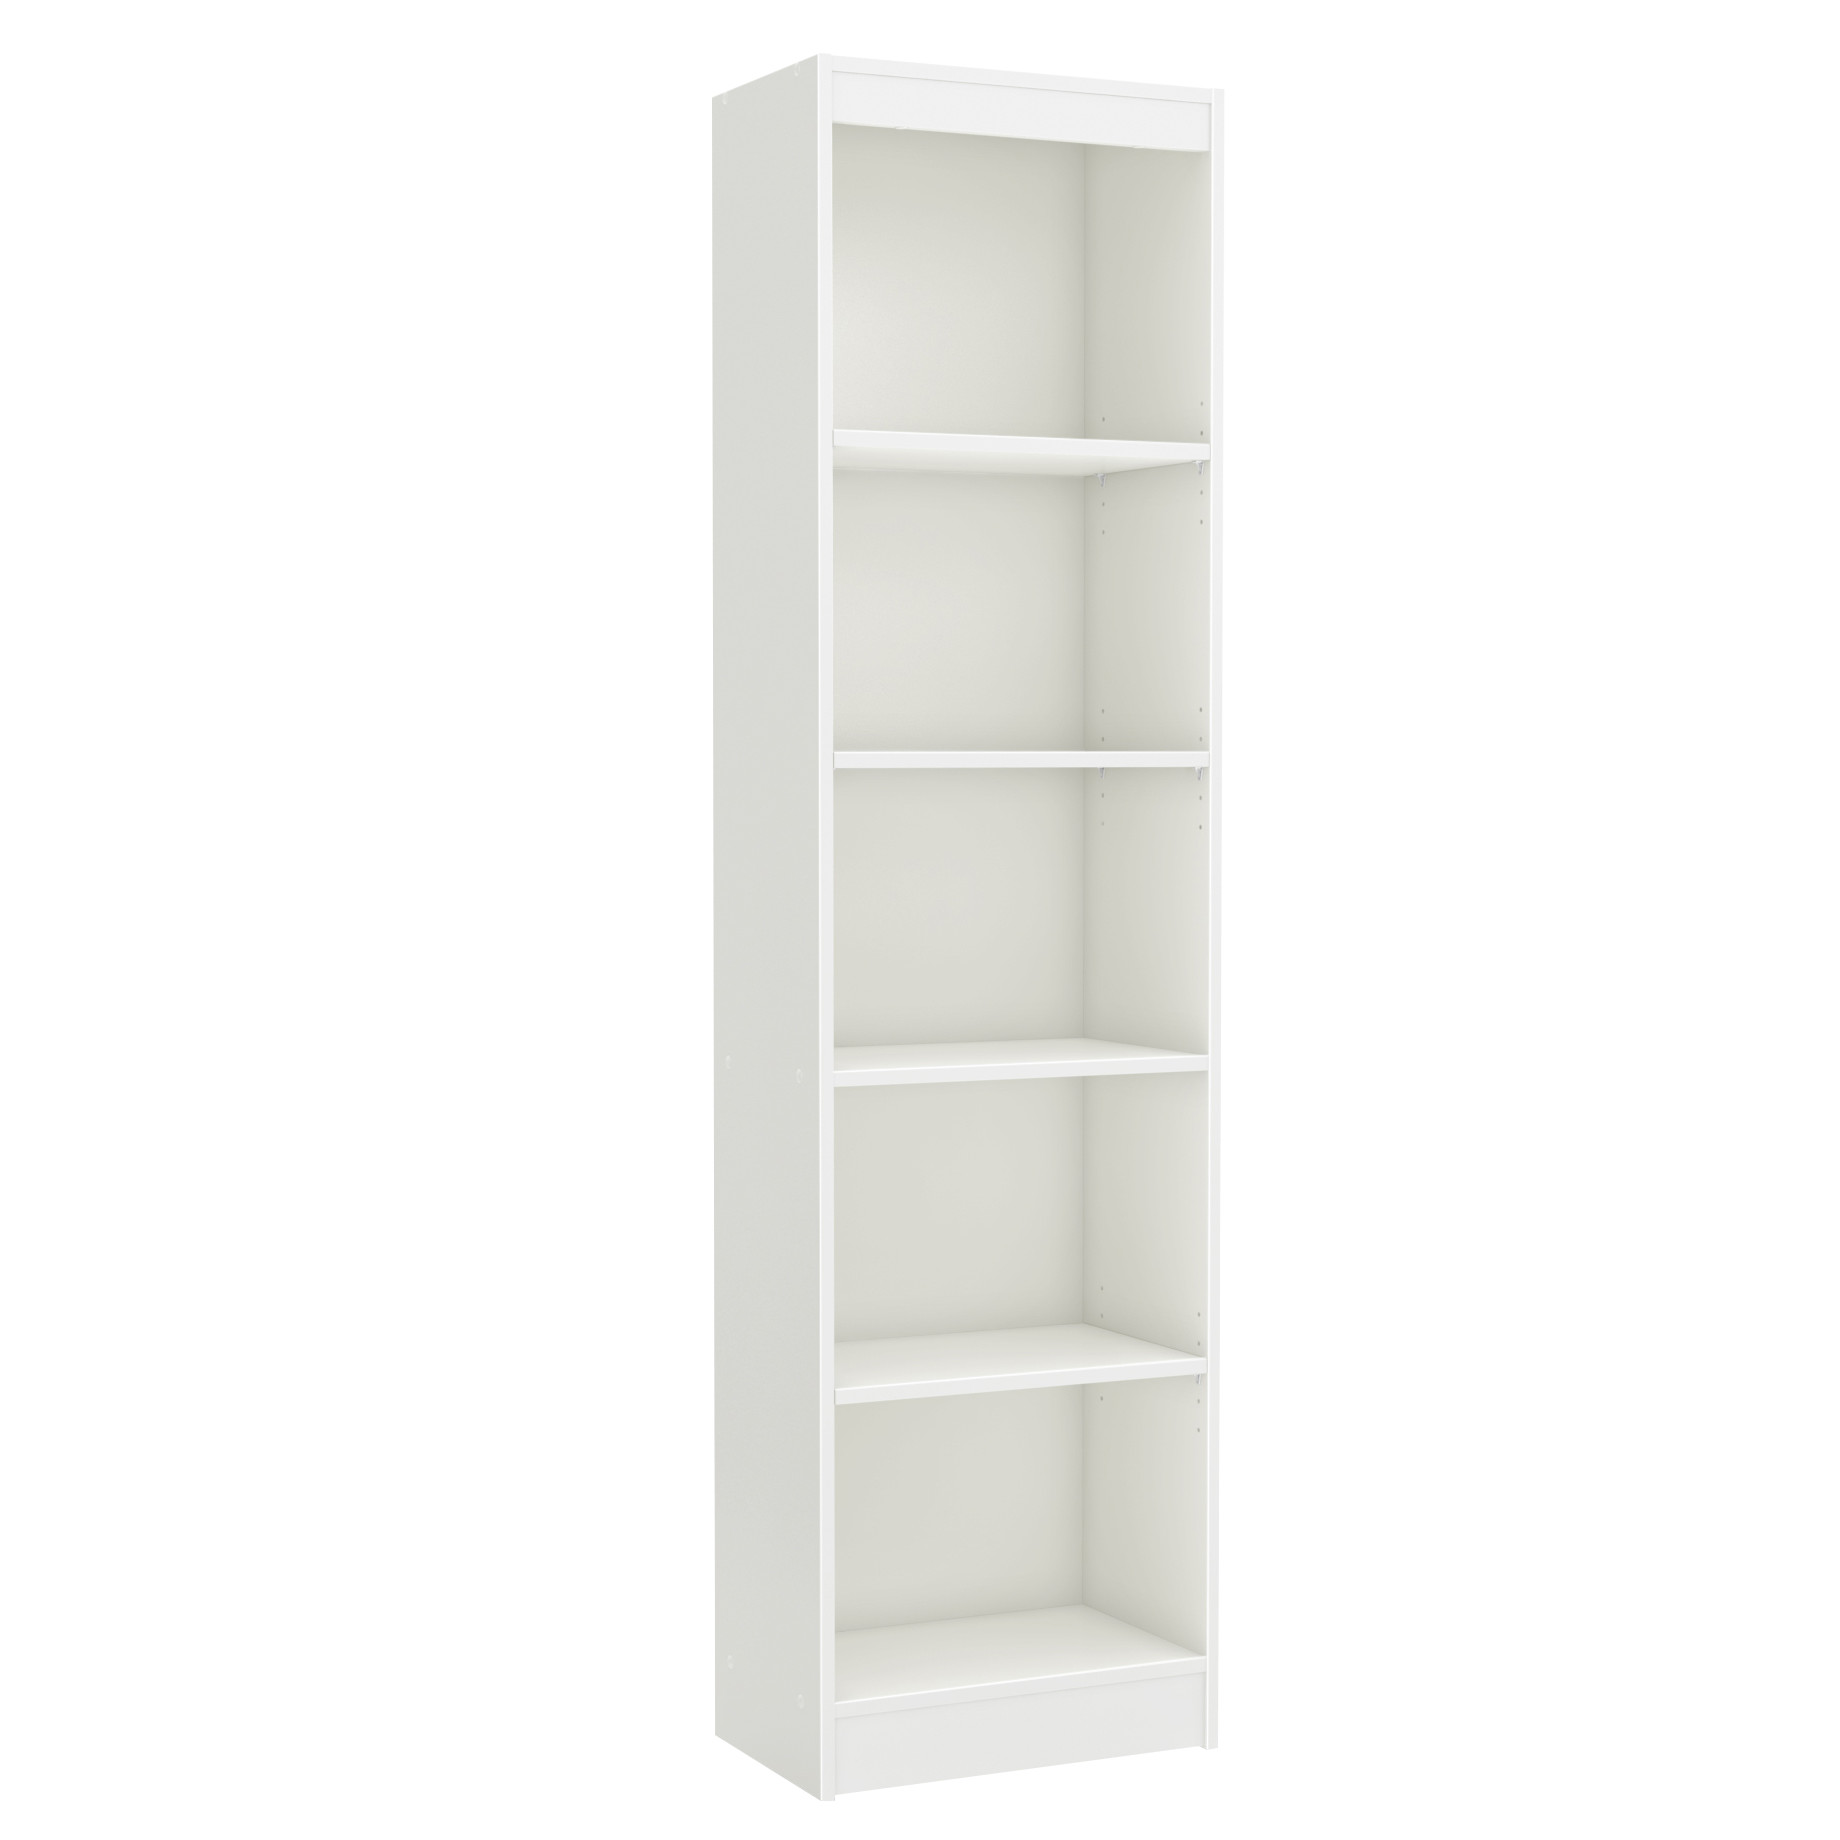 furniture rug creative kmart bookshelves for book organizer